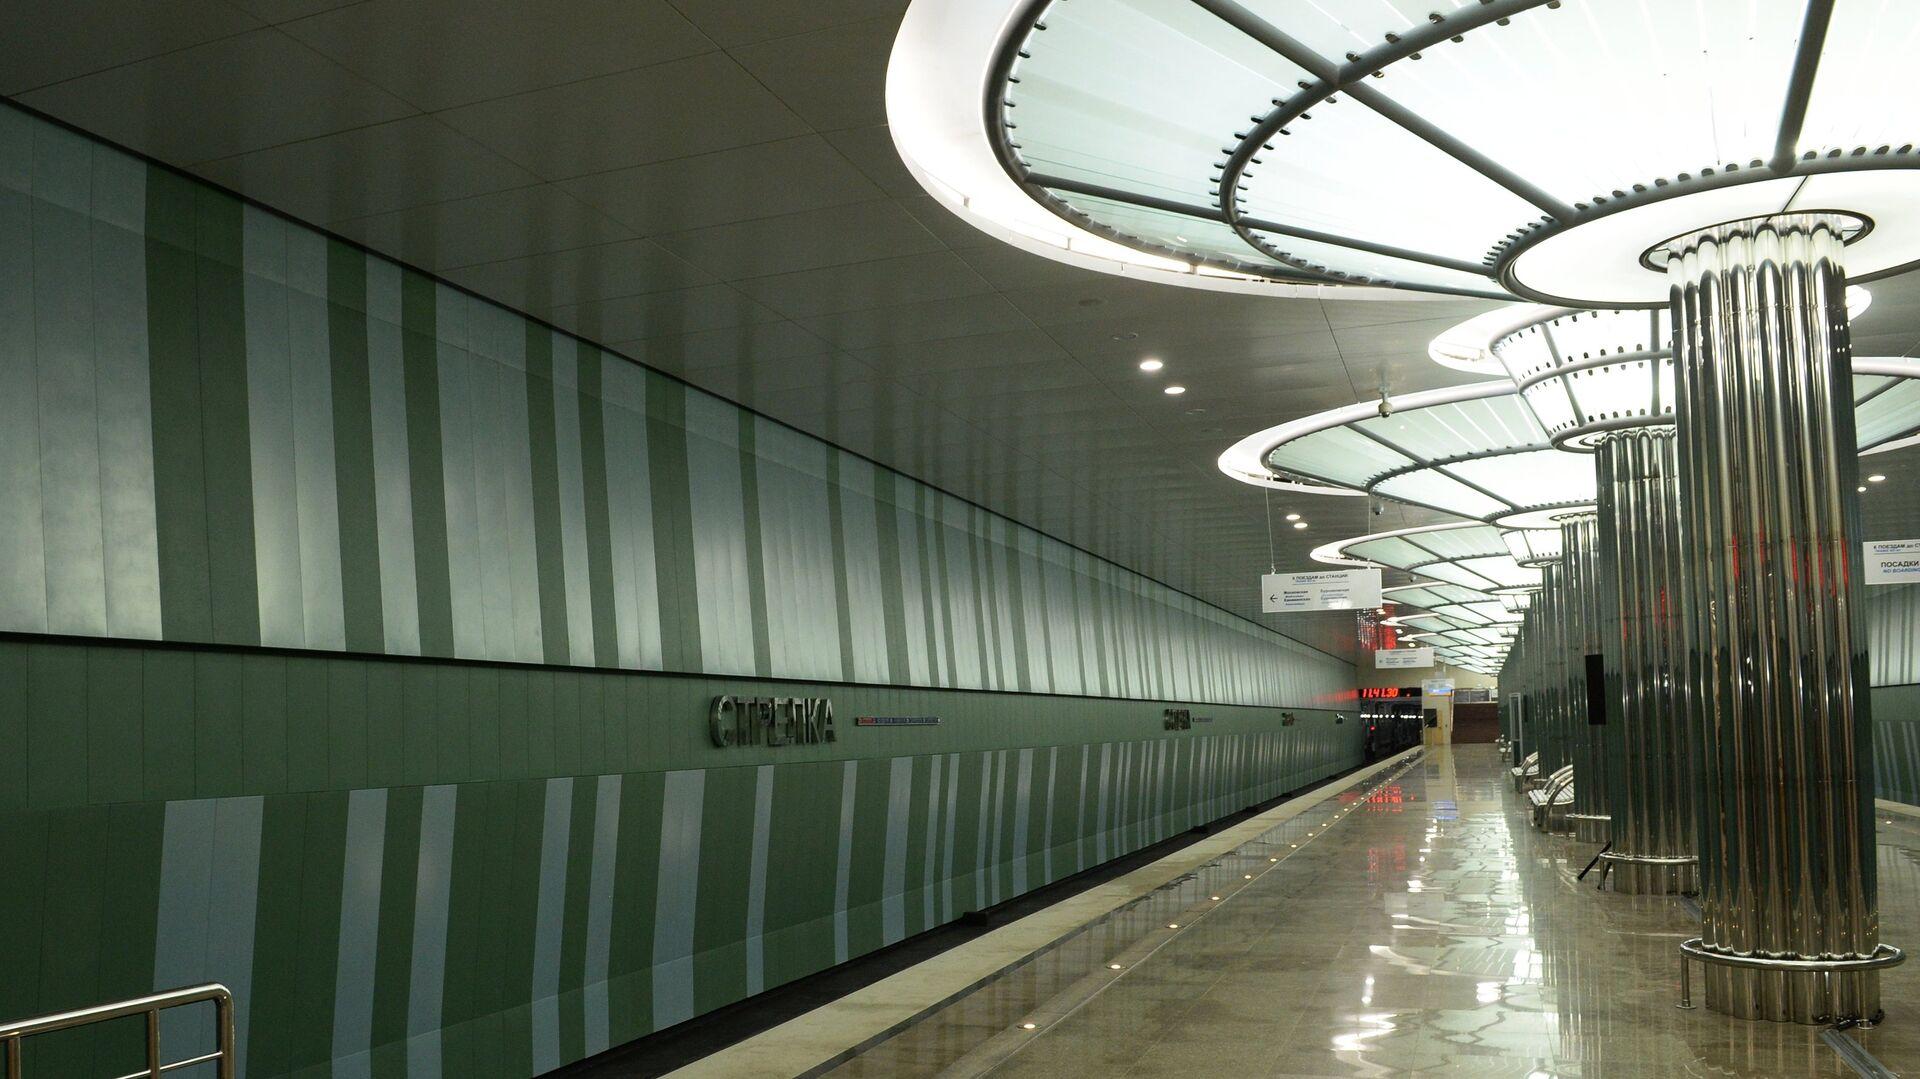 Станция метро Стрелка в Нижнем Новгороде - РИА Новости, 1920, 14.09.2021